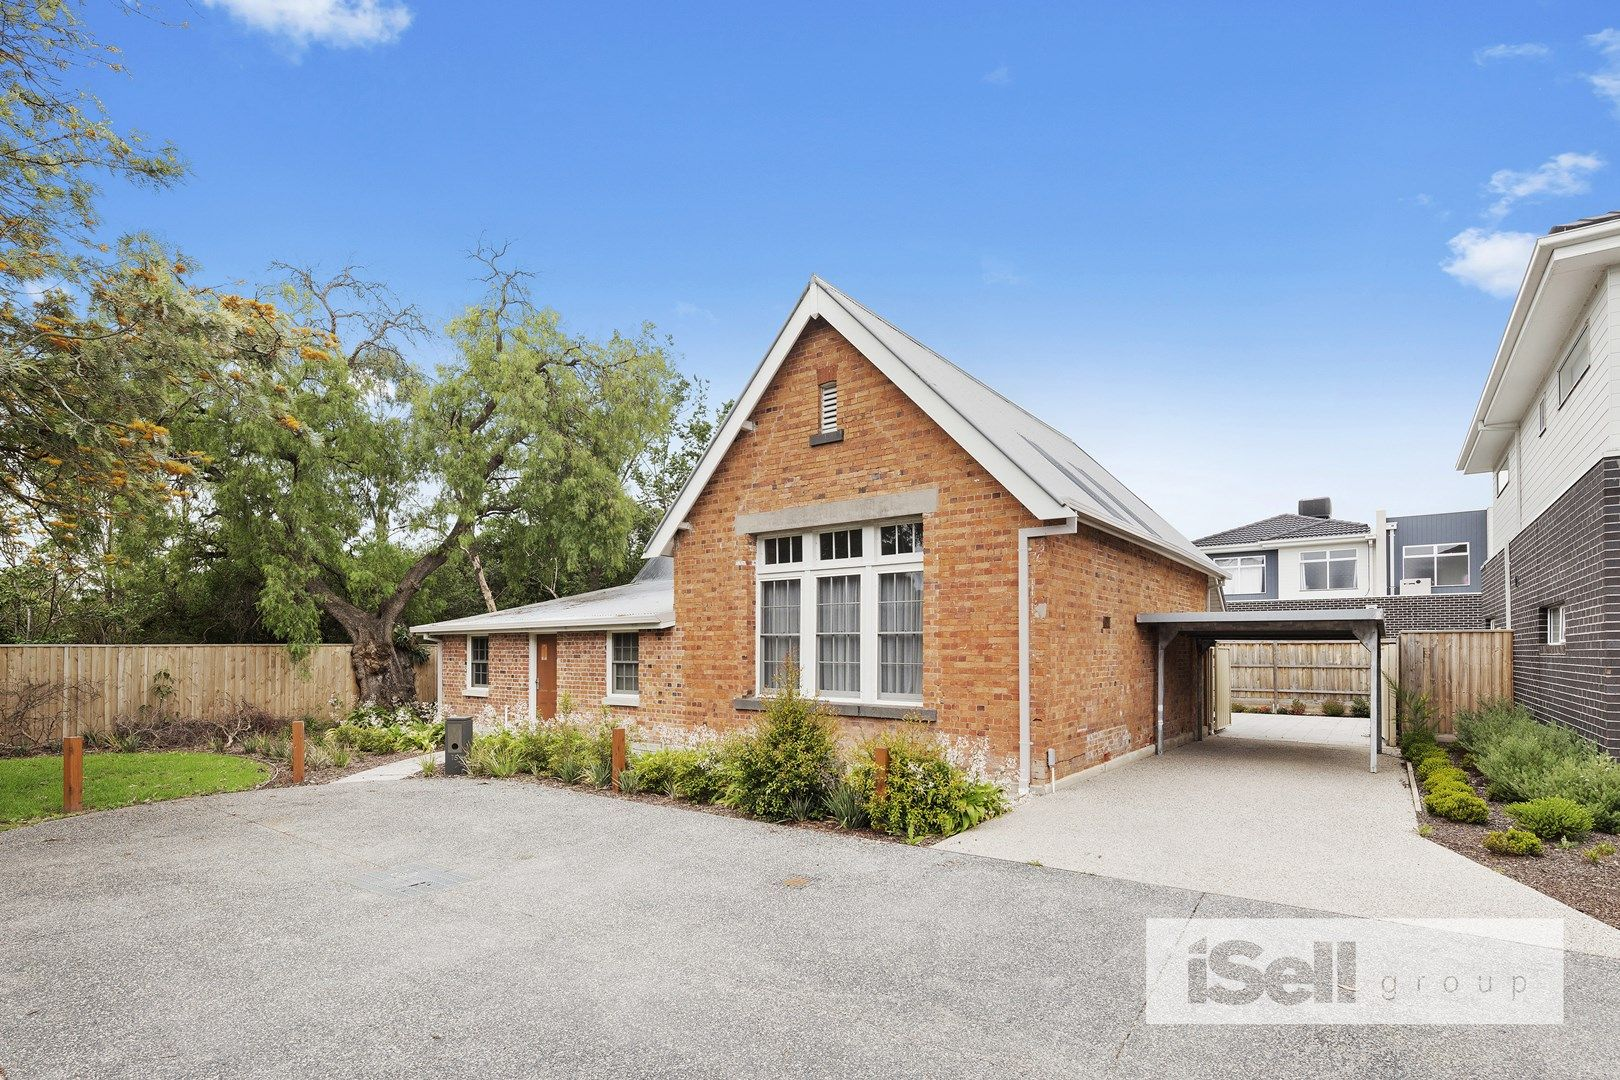 15/170 Chapel Road, Keysborough VIC 3173, Image 0